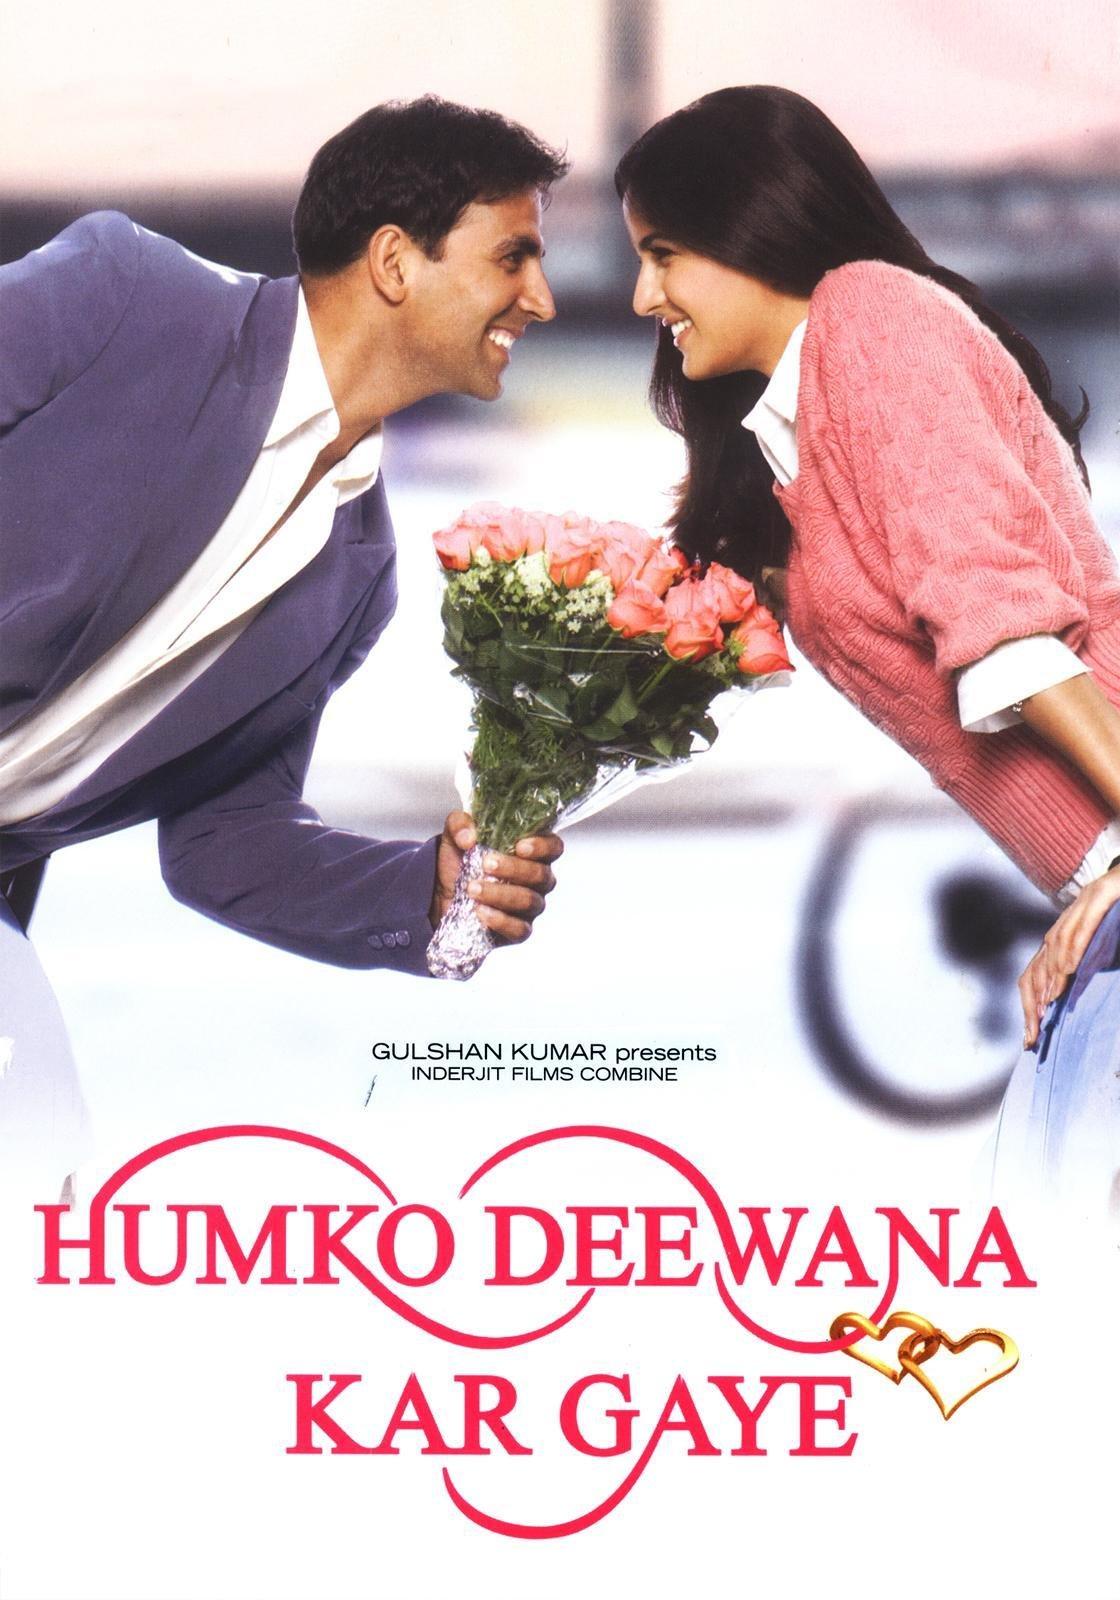 Humko deewana kar gaye sad version (male + female) by arooj   ar.